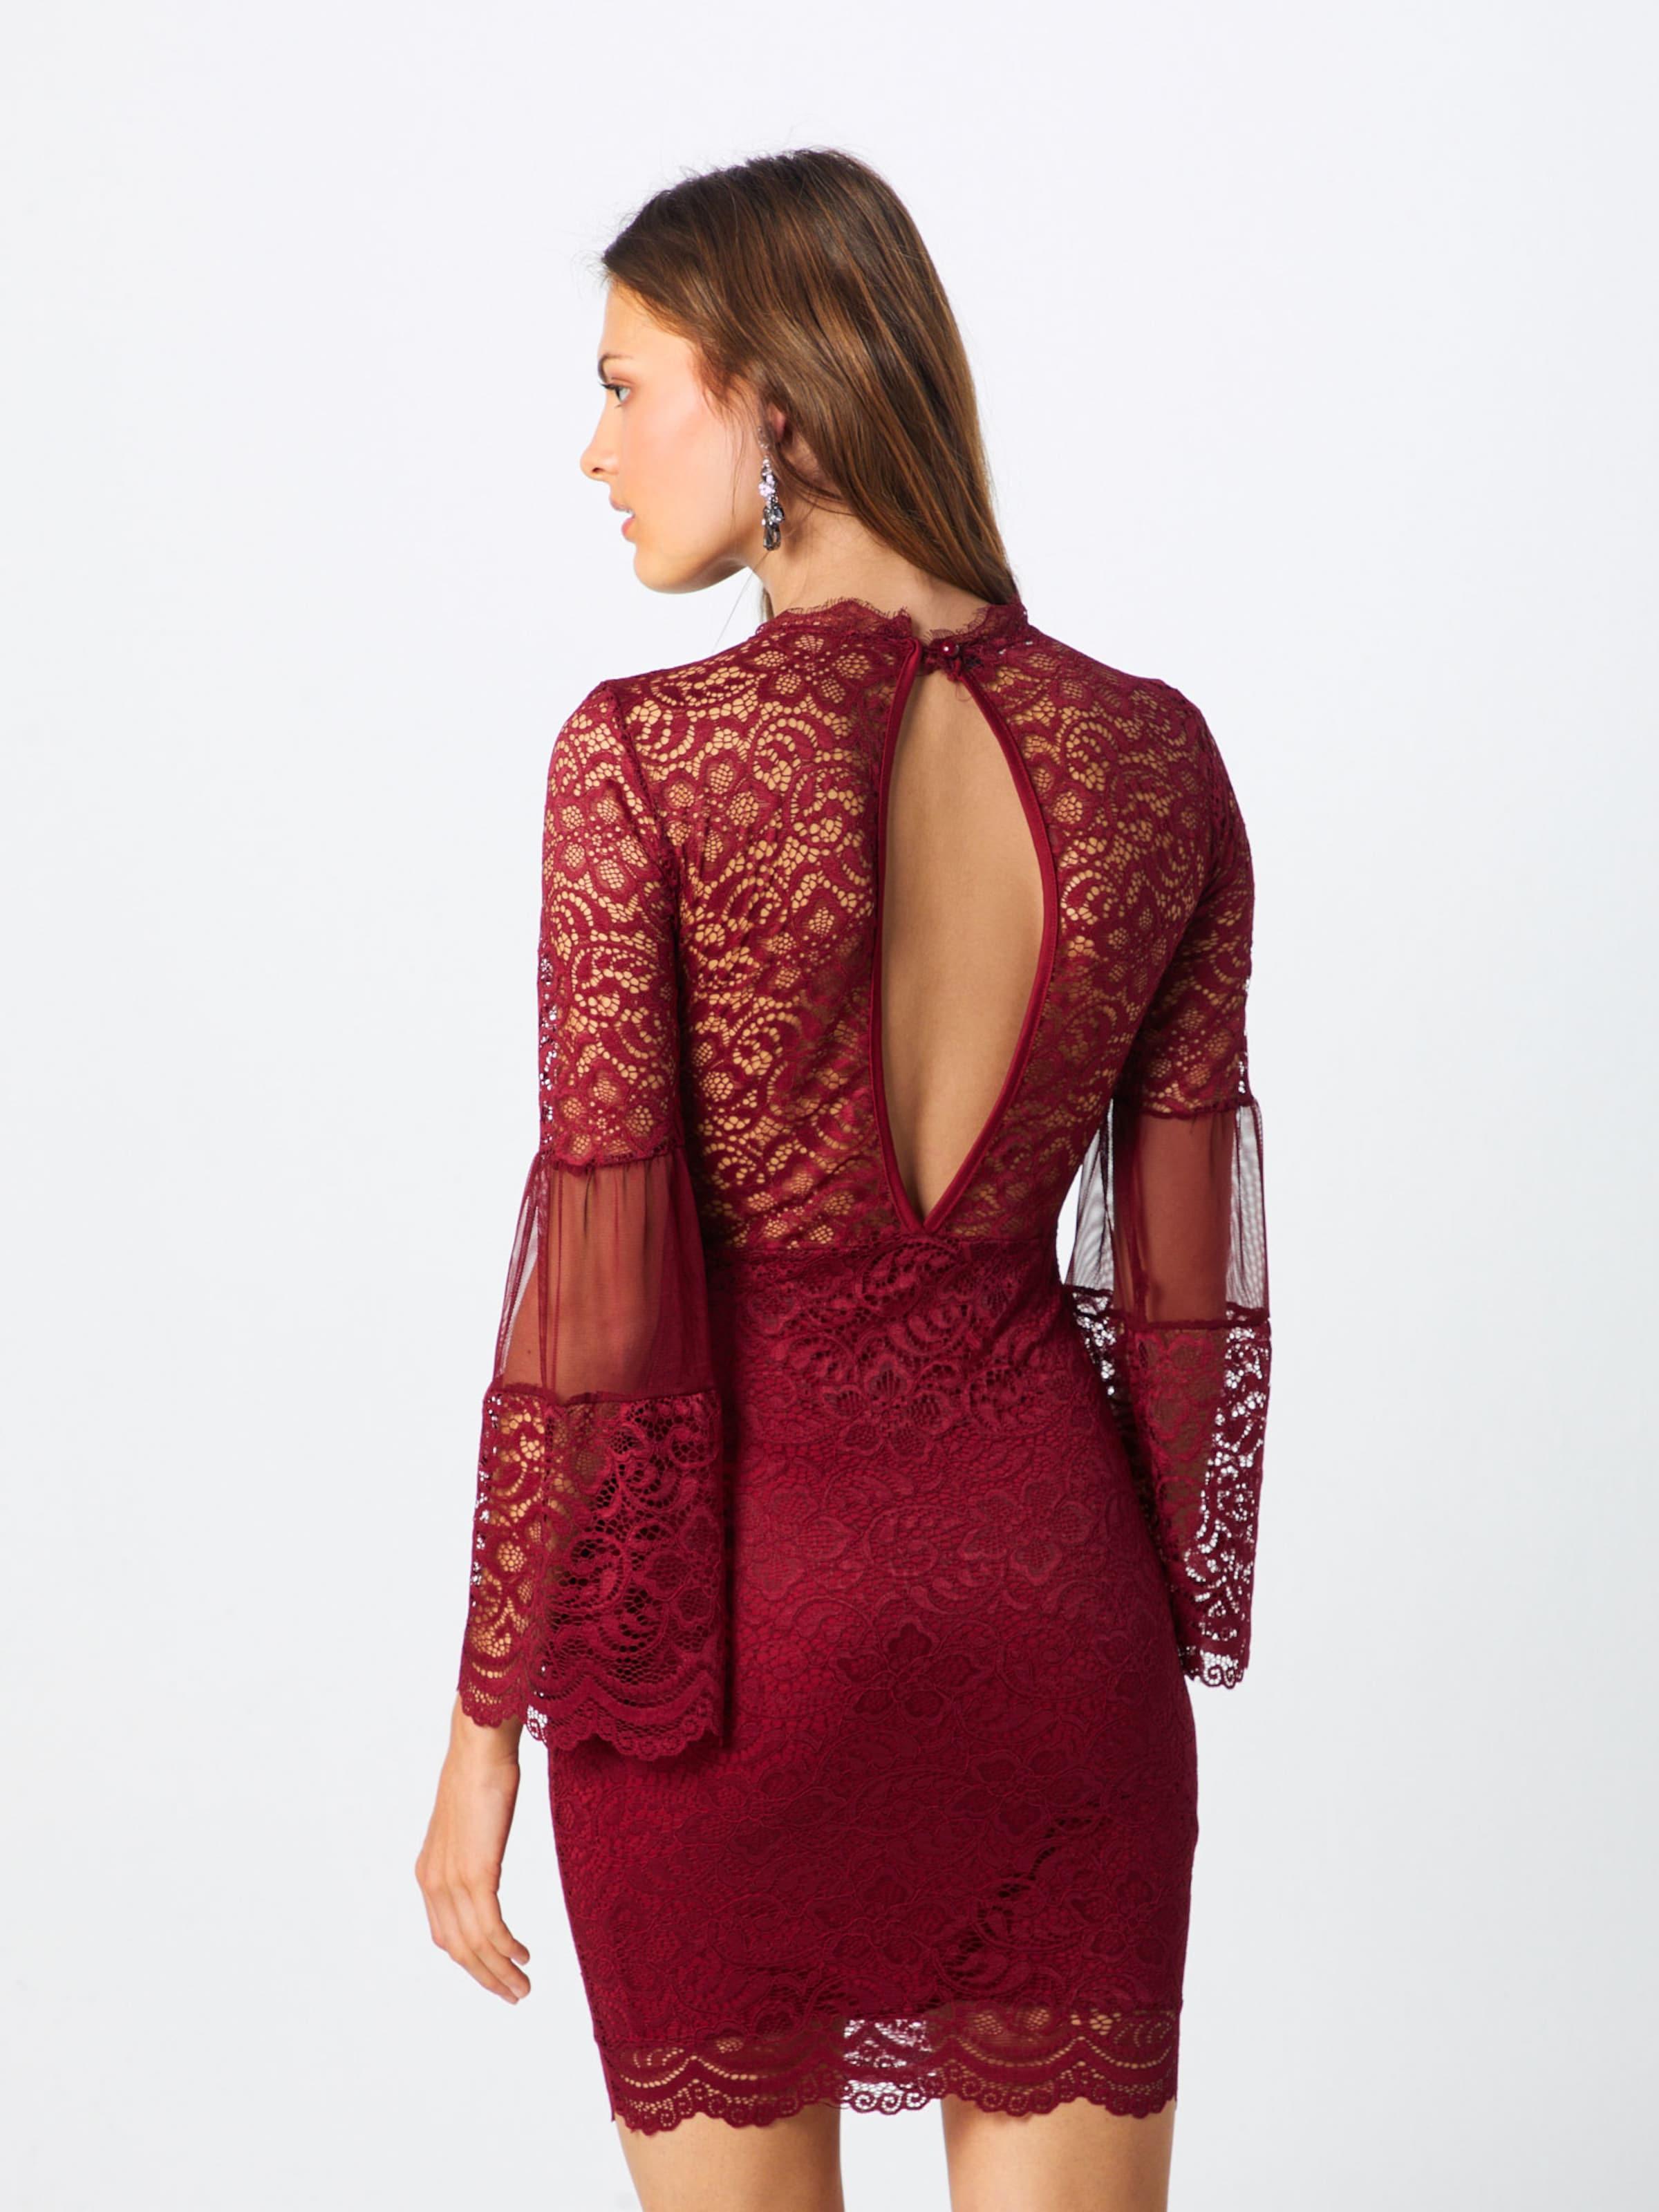 GRobe Wal 'dress' Noir De En Cocktail zSMpUqV